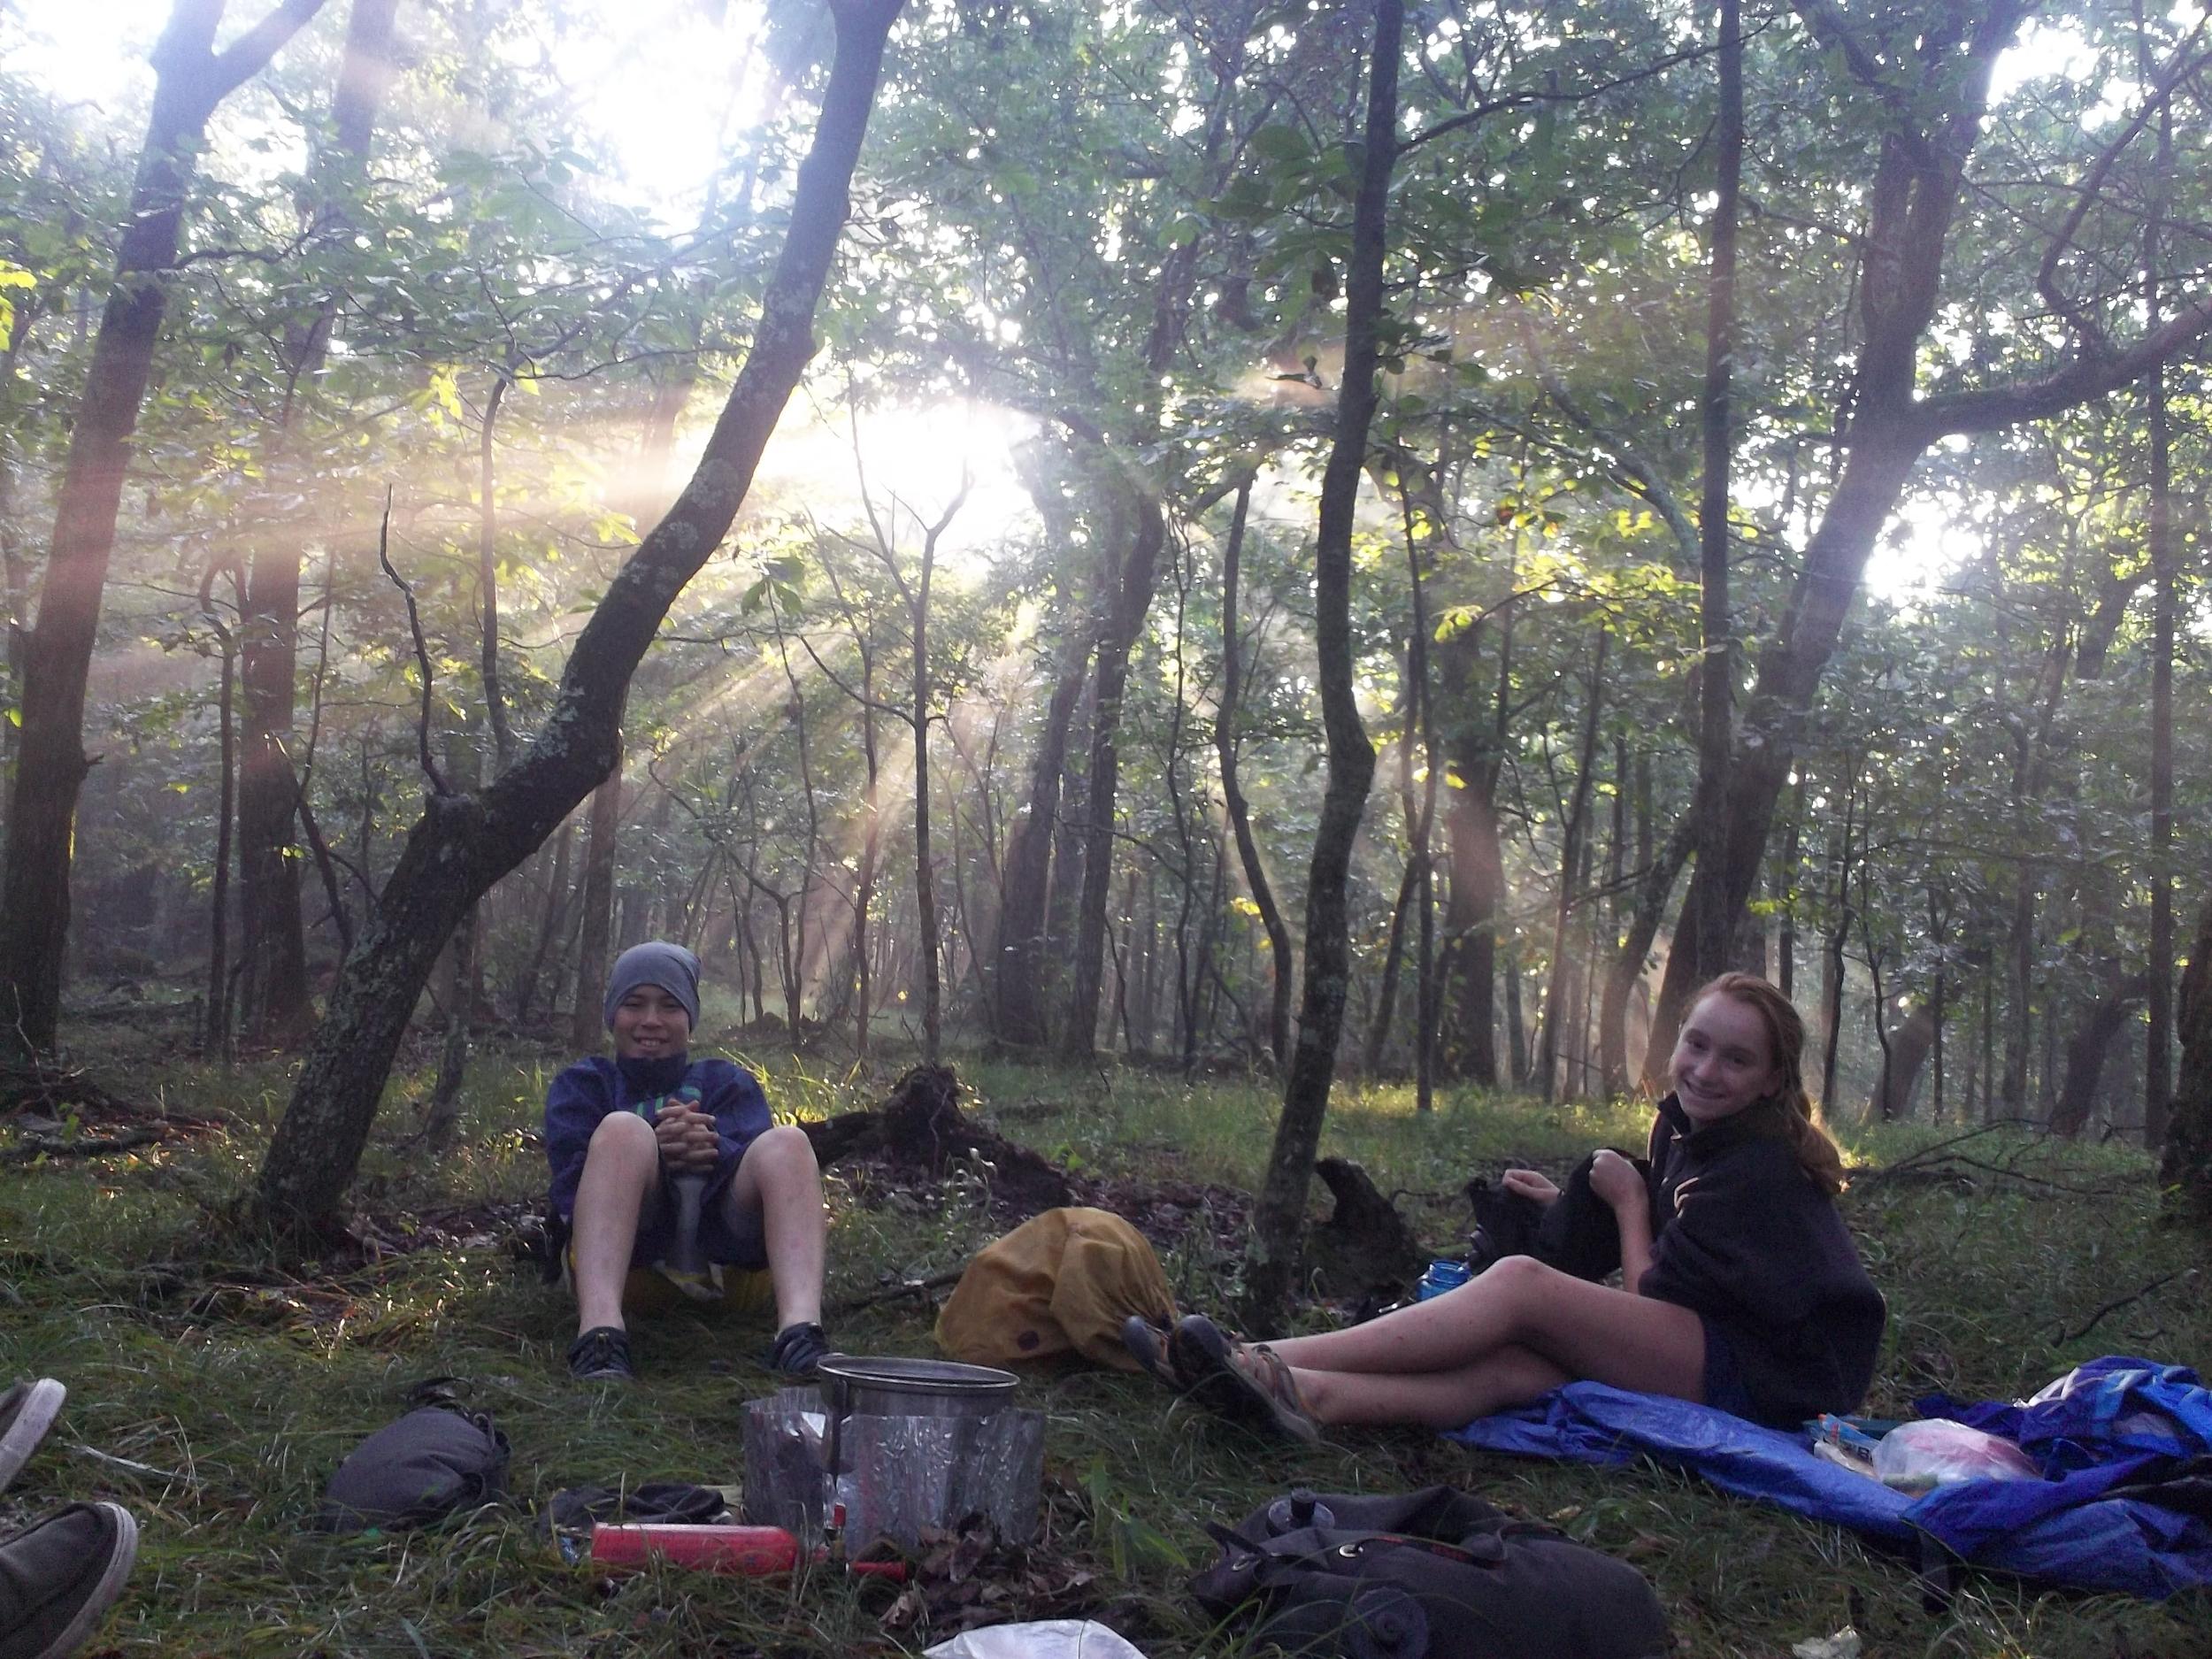 Cool Camping Pic.JPG